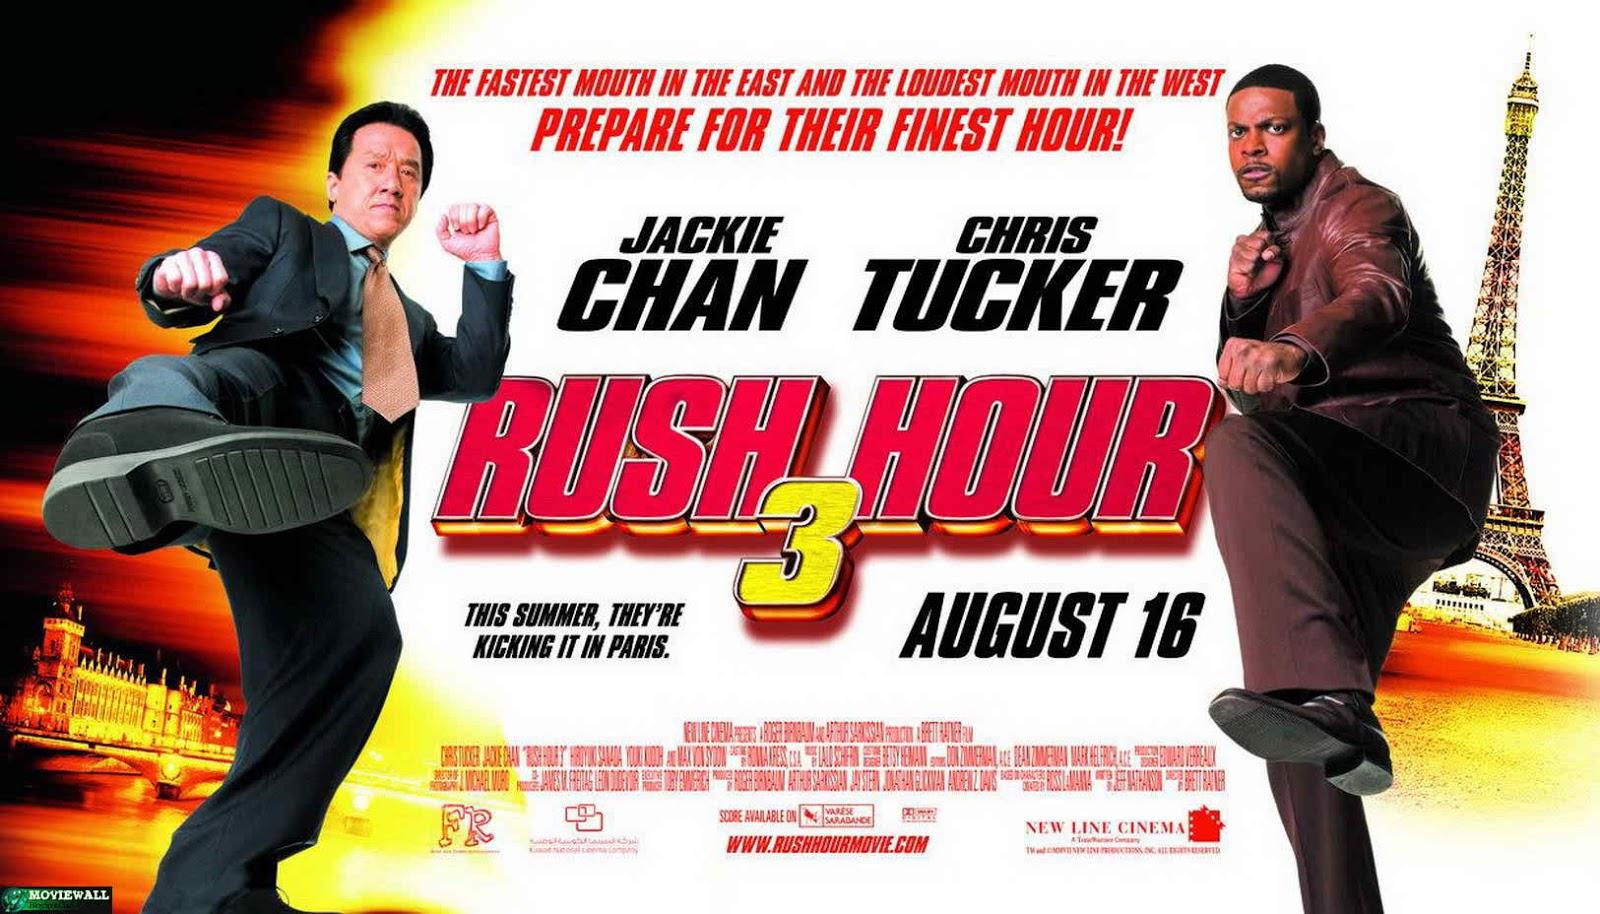 Rush hour 3 full movie download in hindi filmywap